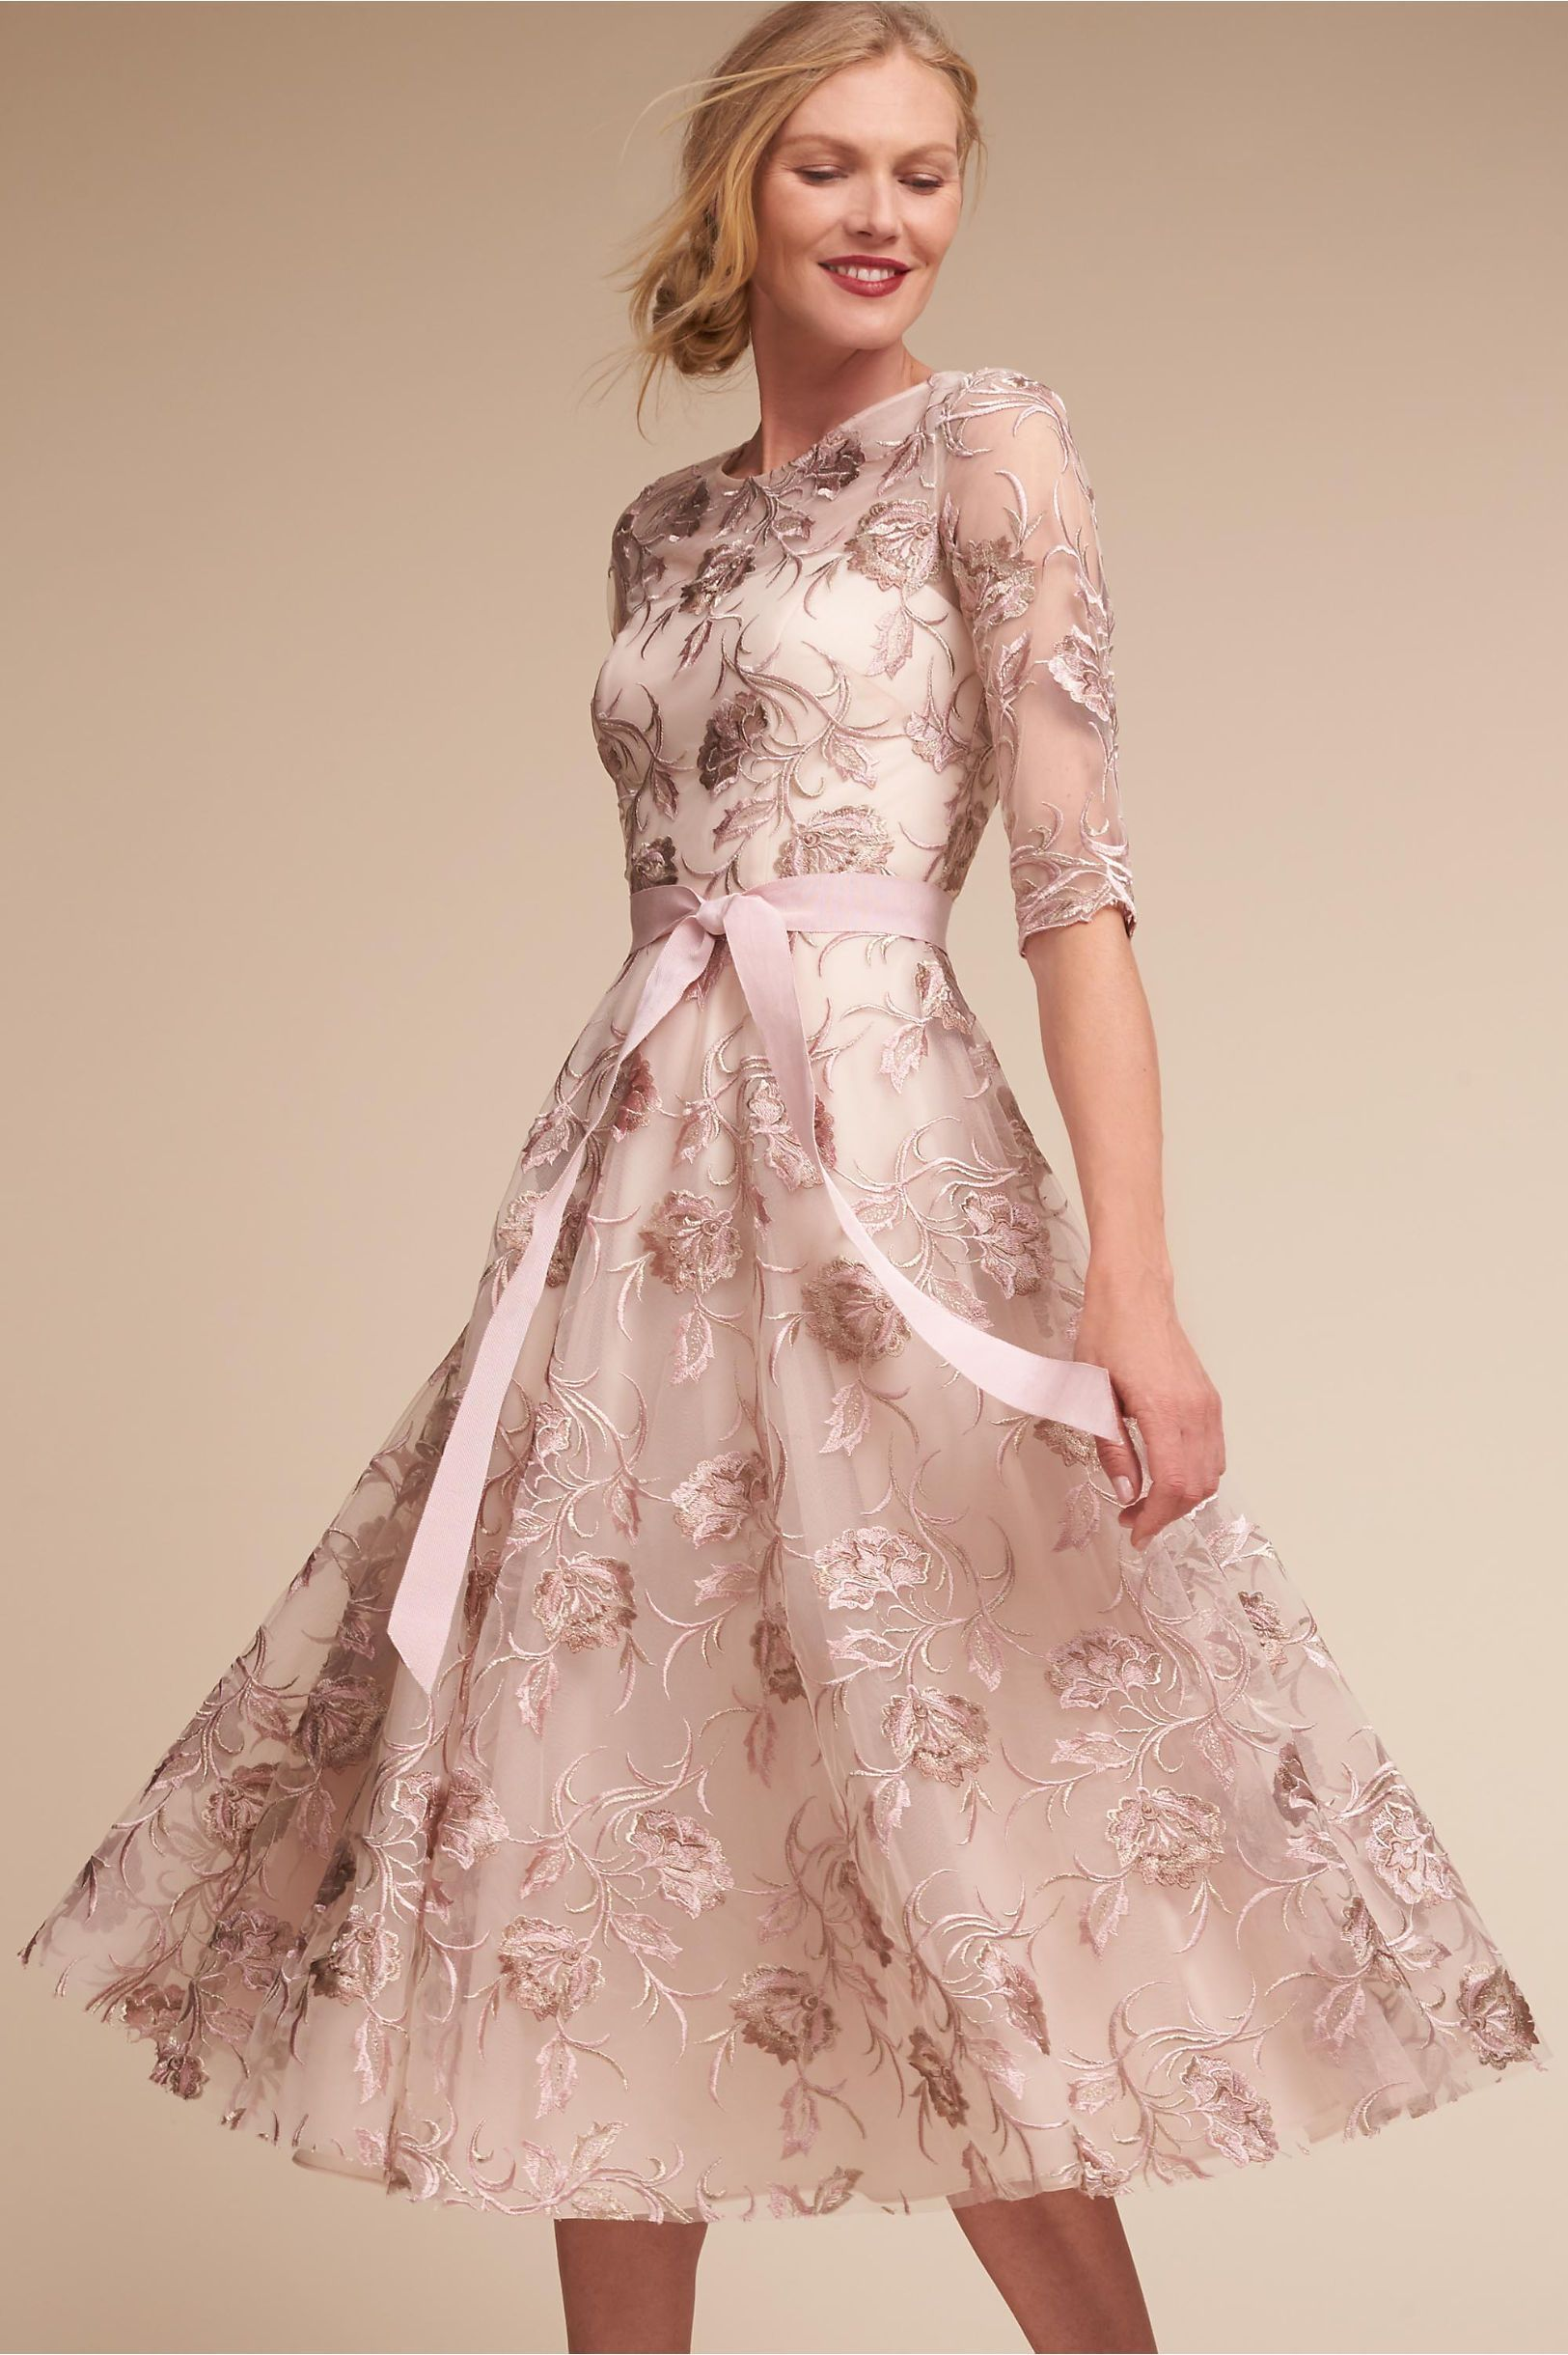 $280 | BHLDN Blush Multi Linden Dress in Occasion Dresses | BHLDN ...